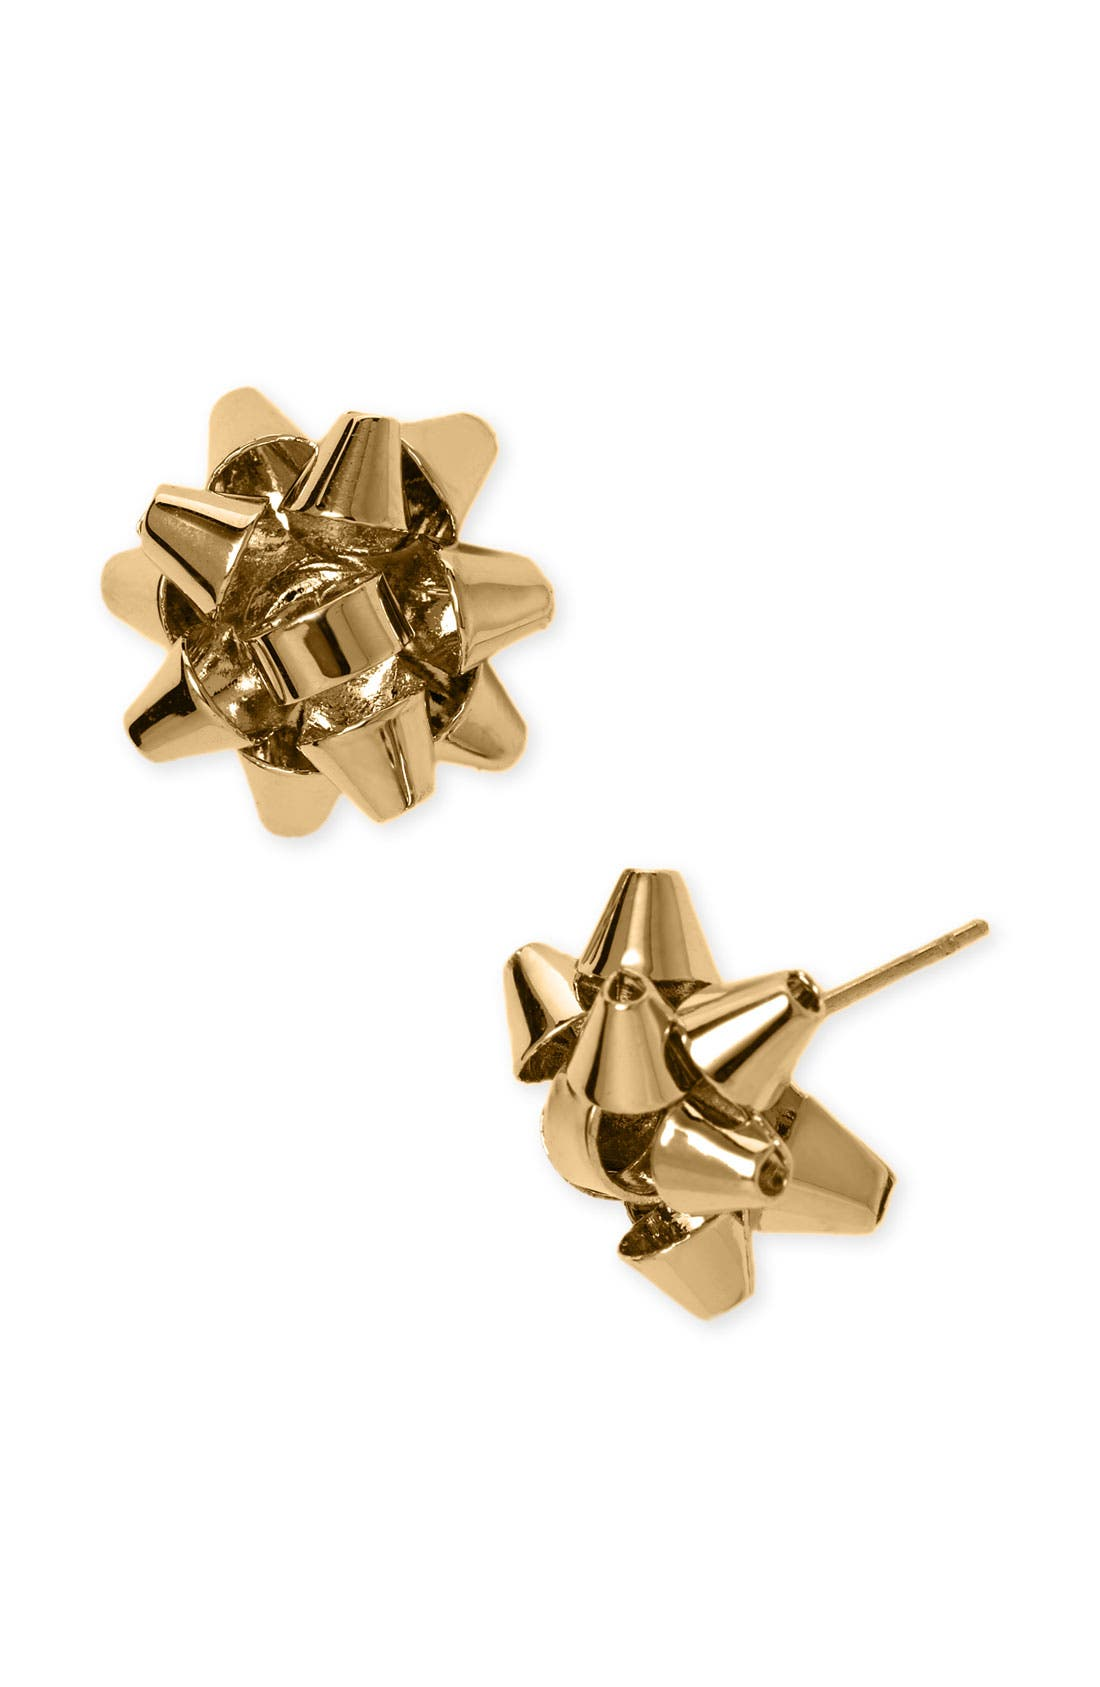 Alternate Image 1 Selected - kate spade 'bourgeois bow' stud earrings